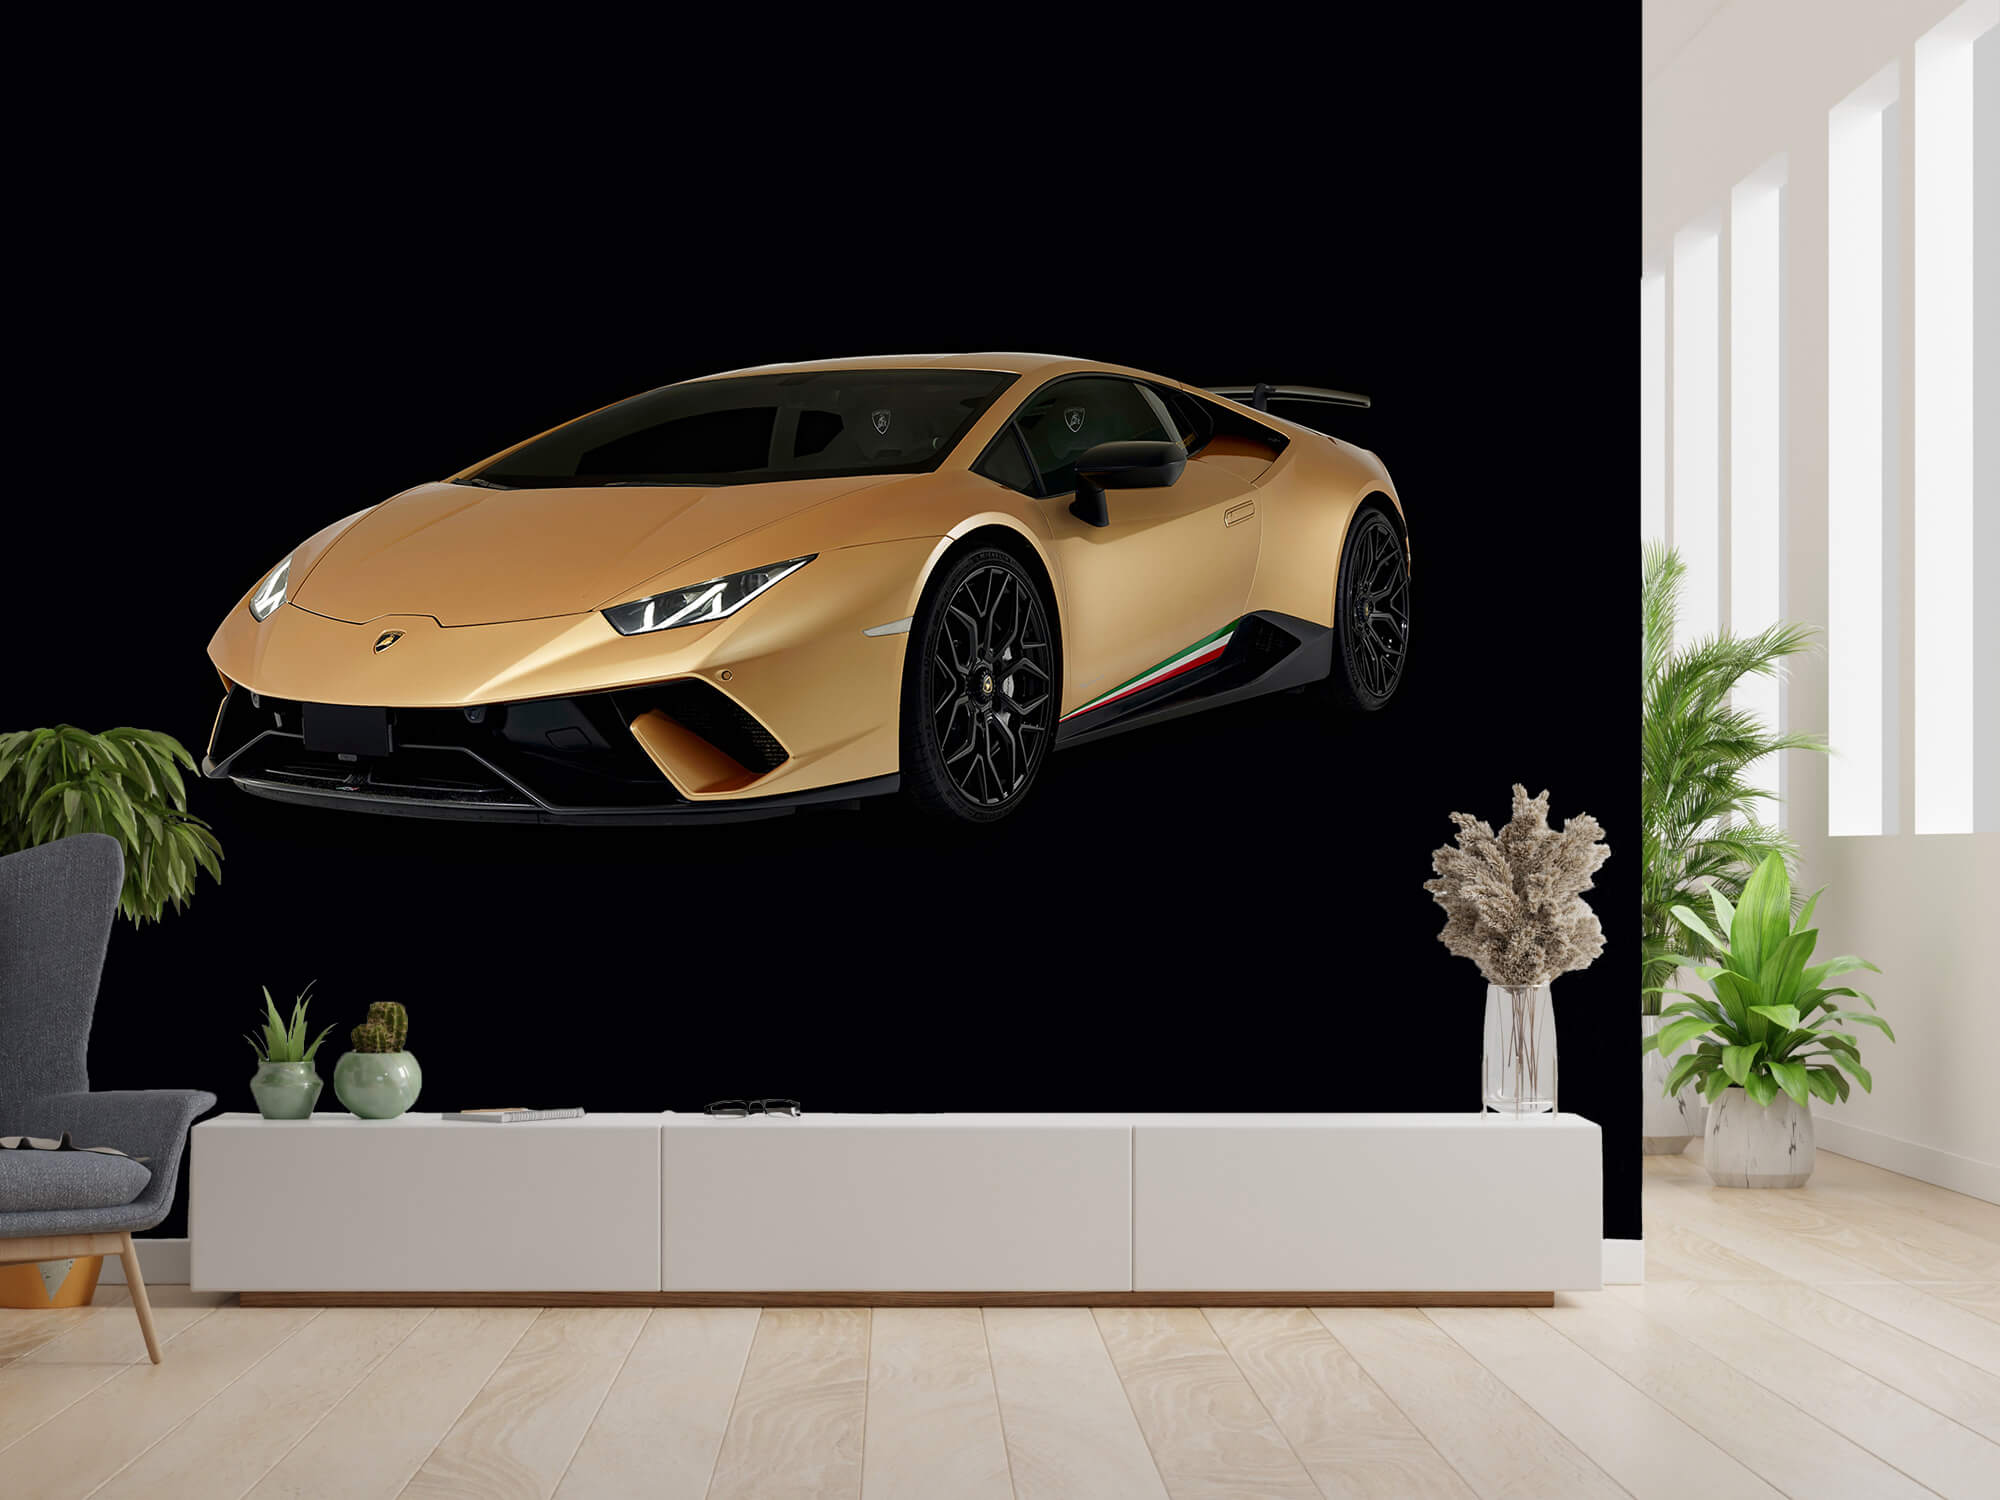 Wallpaper Lamborghini Huracán - Avant droit, noir 4